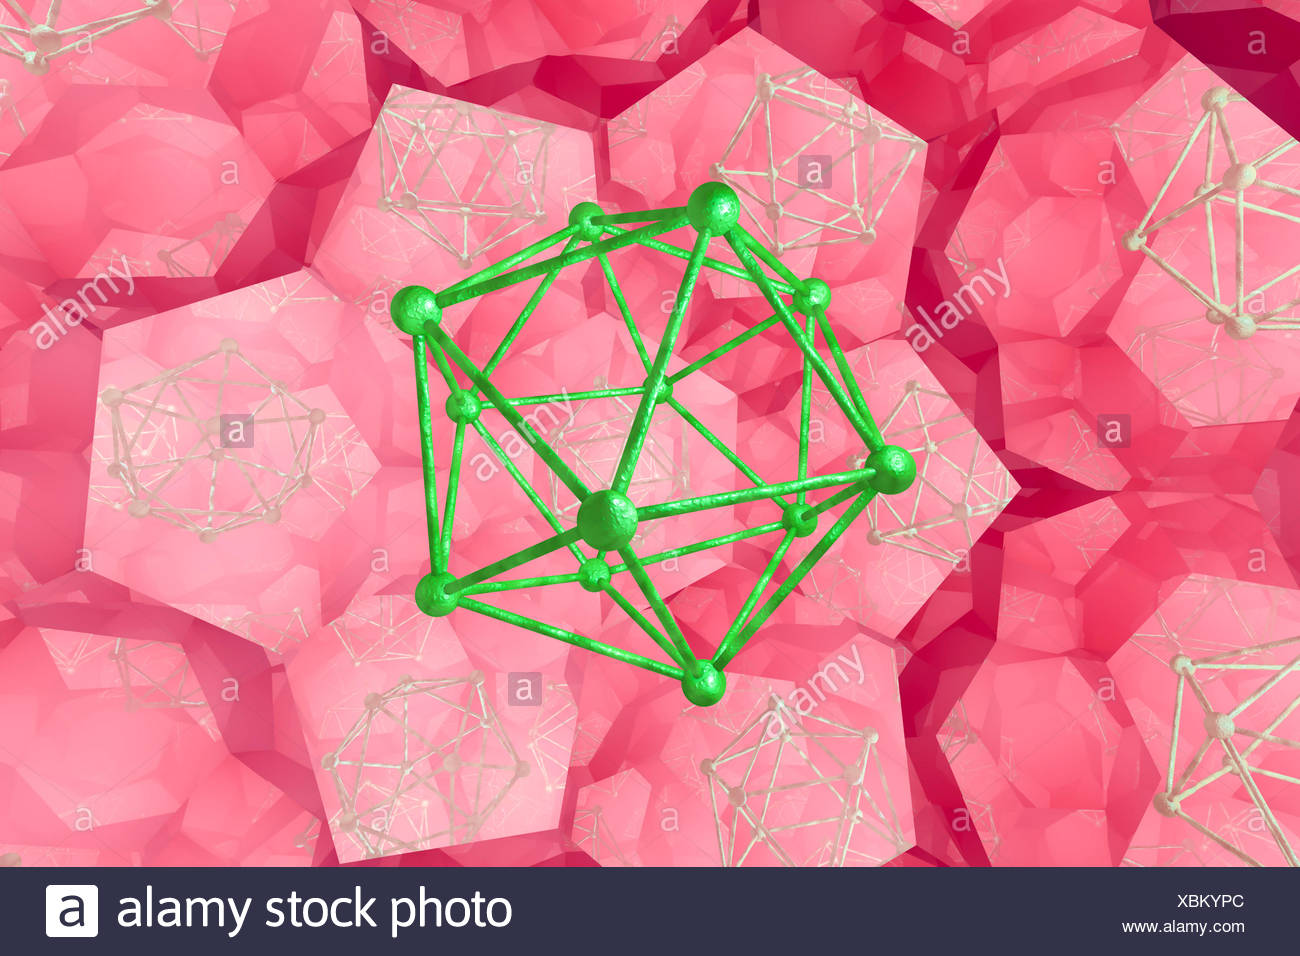 Molecules, computer illustration. - Stock Image